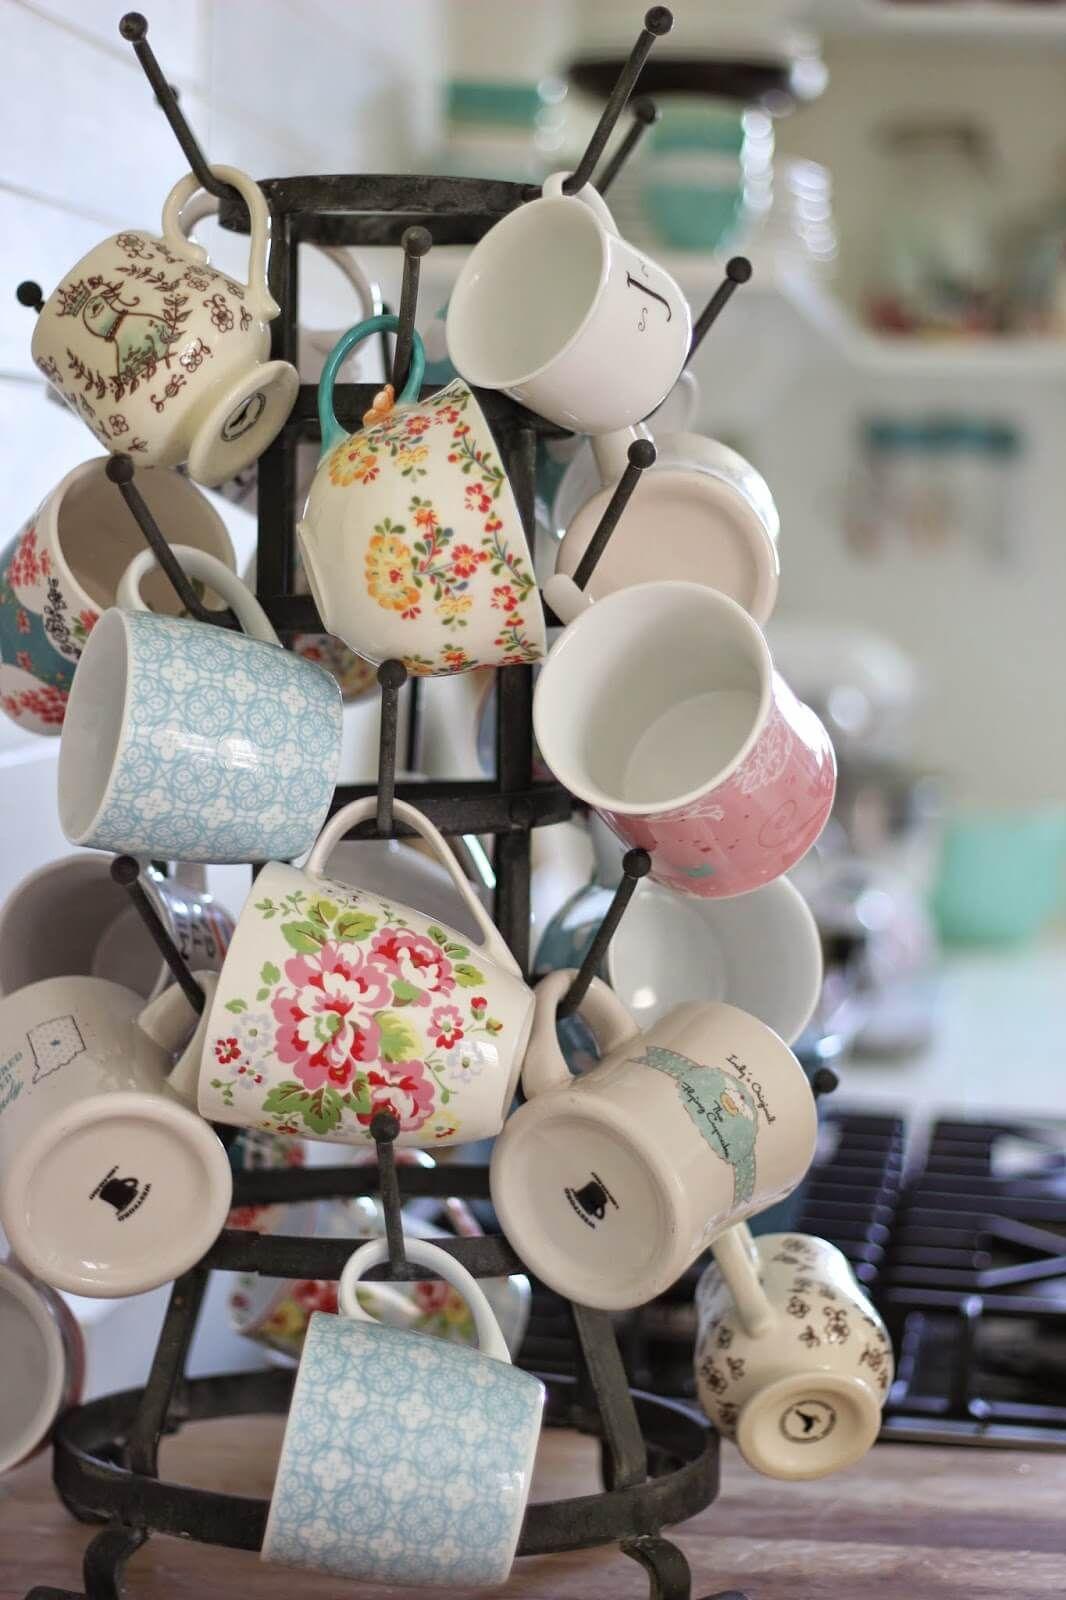 24 Fun And Creative Coffee Mug Organization Ideas Con Immagini